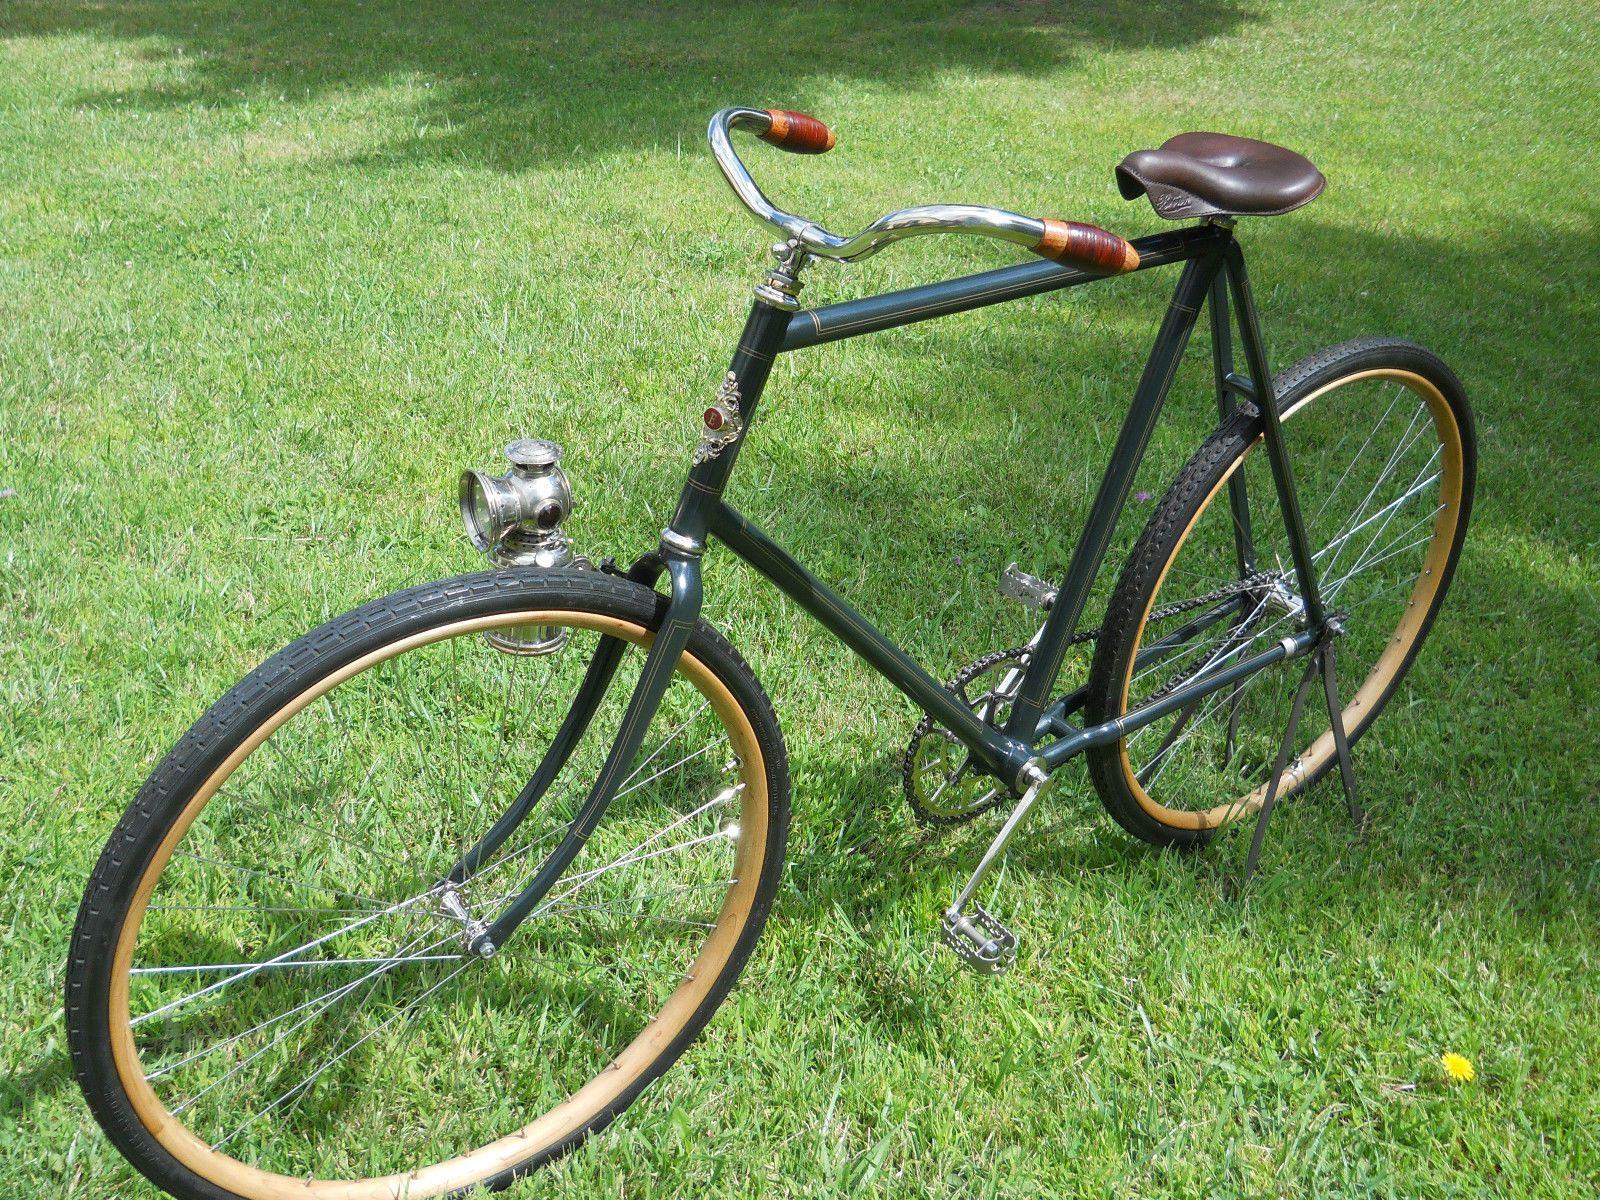 Colnago Super Restored Ebay Antique Bicycles Bicycle Bike Restoration